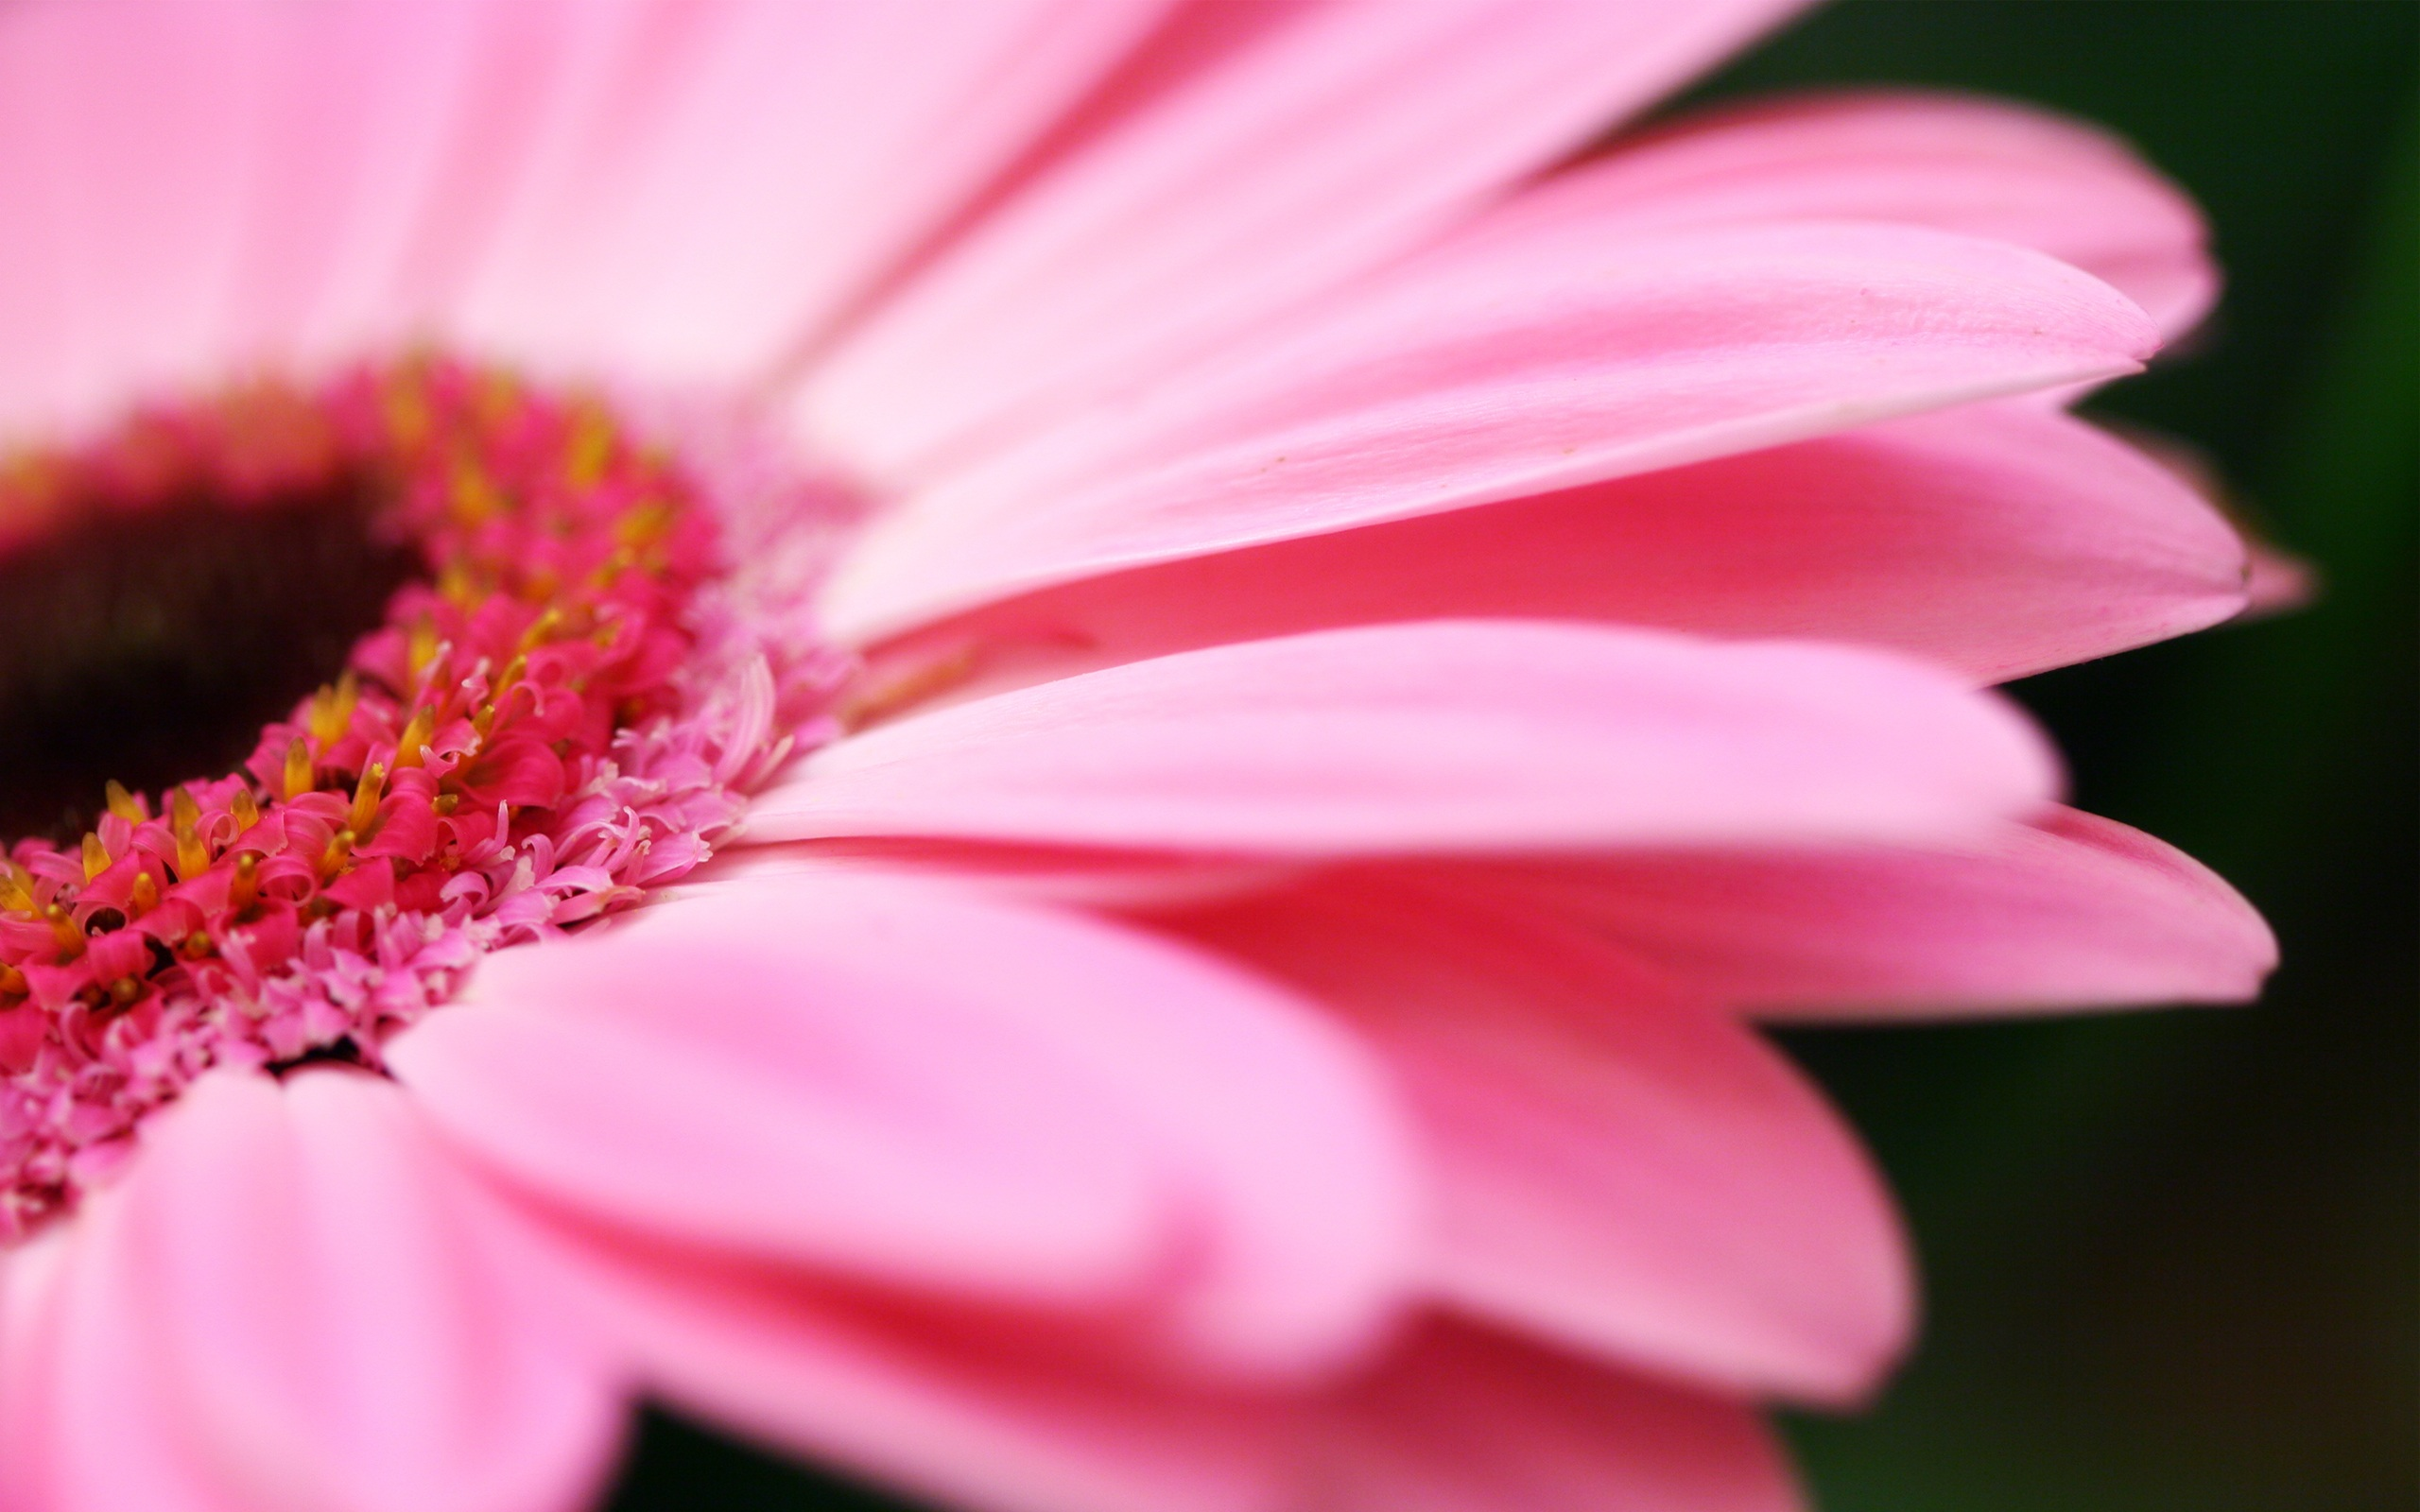 rosa blume makro 2560x1600 hd hintergrundbilder hd bild. Black Bedroom Furniture Sets. Home Design Ideas